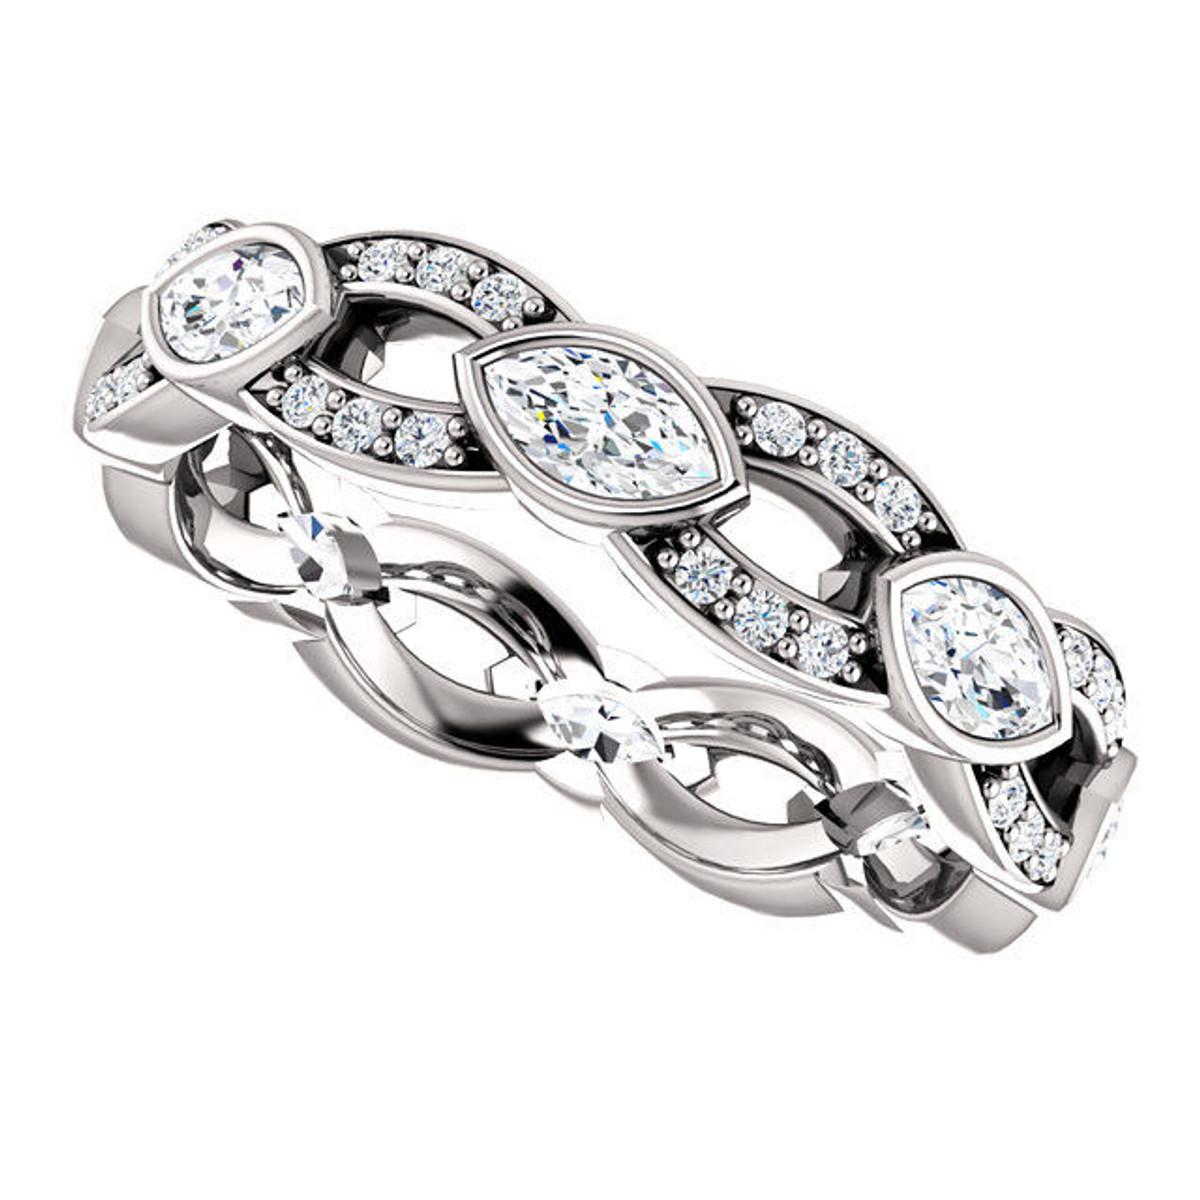 White Gold Marquise Diamond Eternity Ring